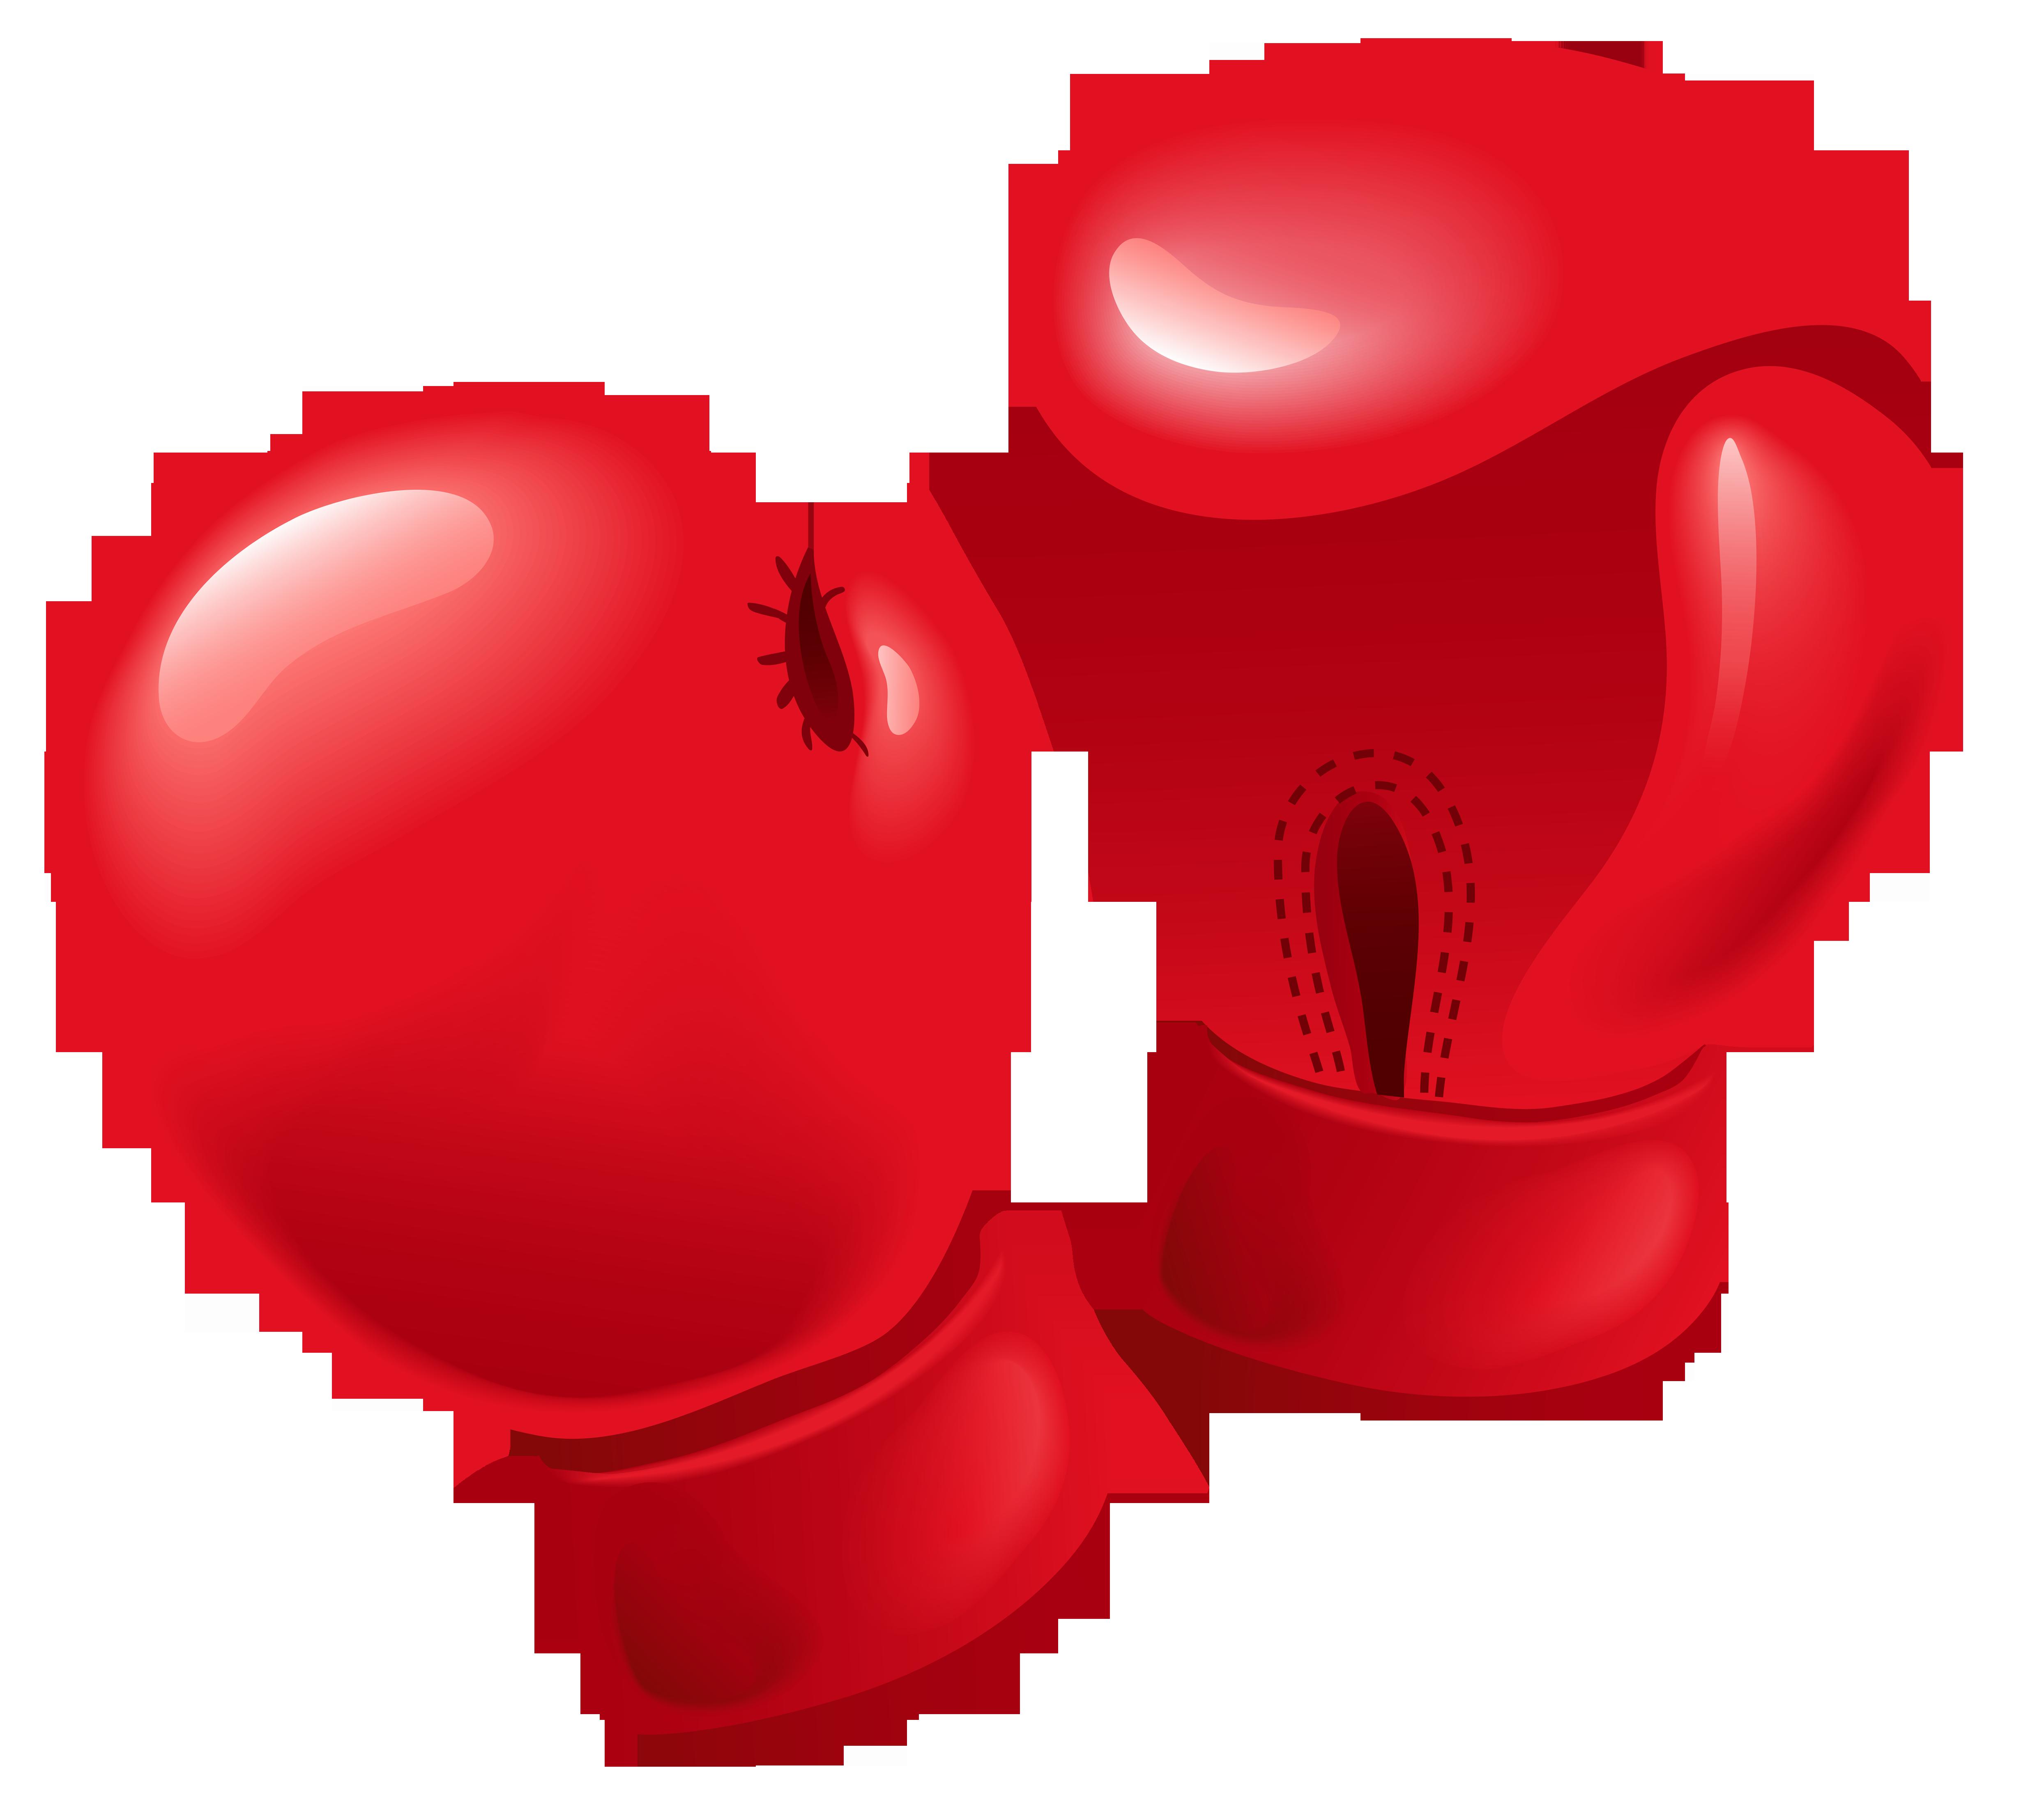 Shiv Naresh Teens Boxing Gloves 12oz: Boxing Glove PNG Image - PurePNG